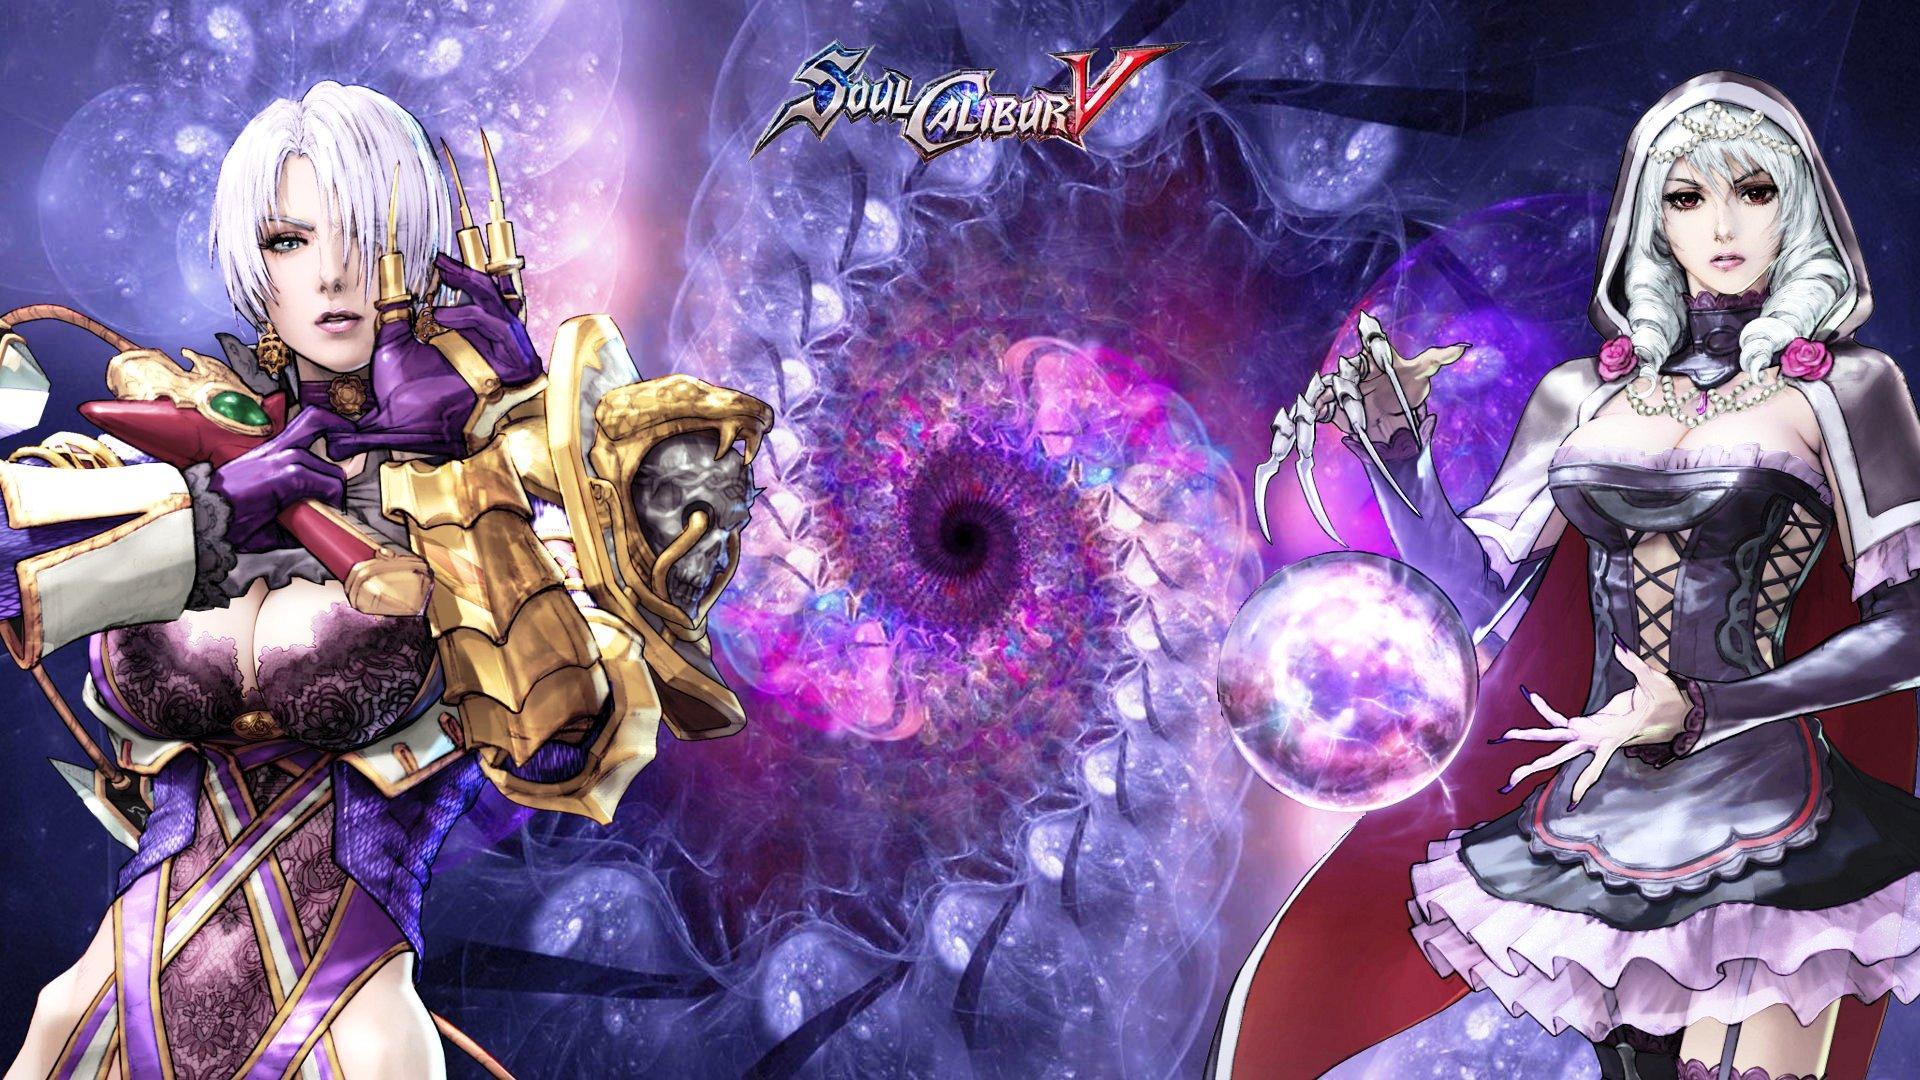 Soulcalibur computer wallpapers desktop backgrounds - Soul calibur wallpaper ...